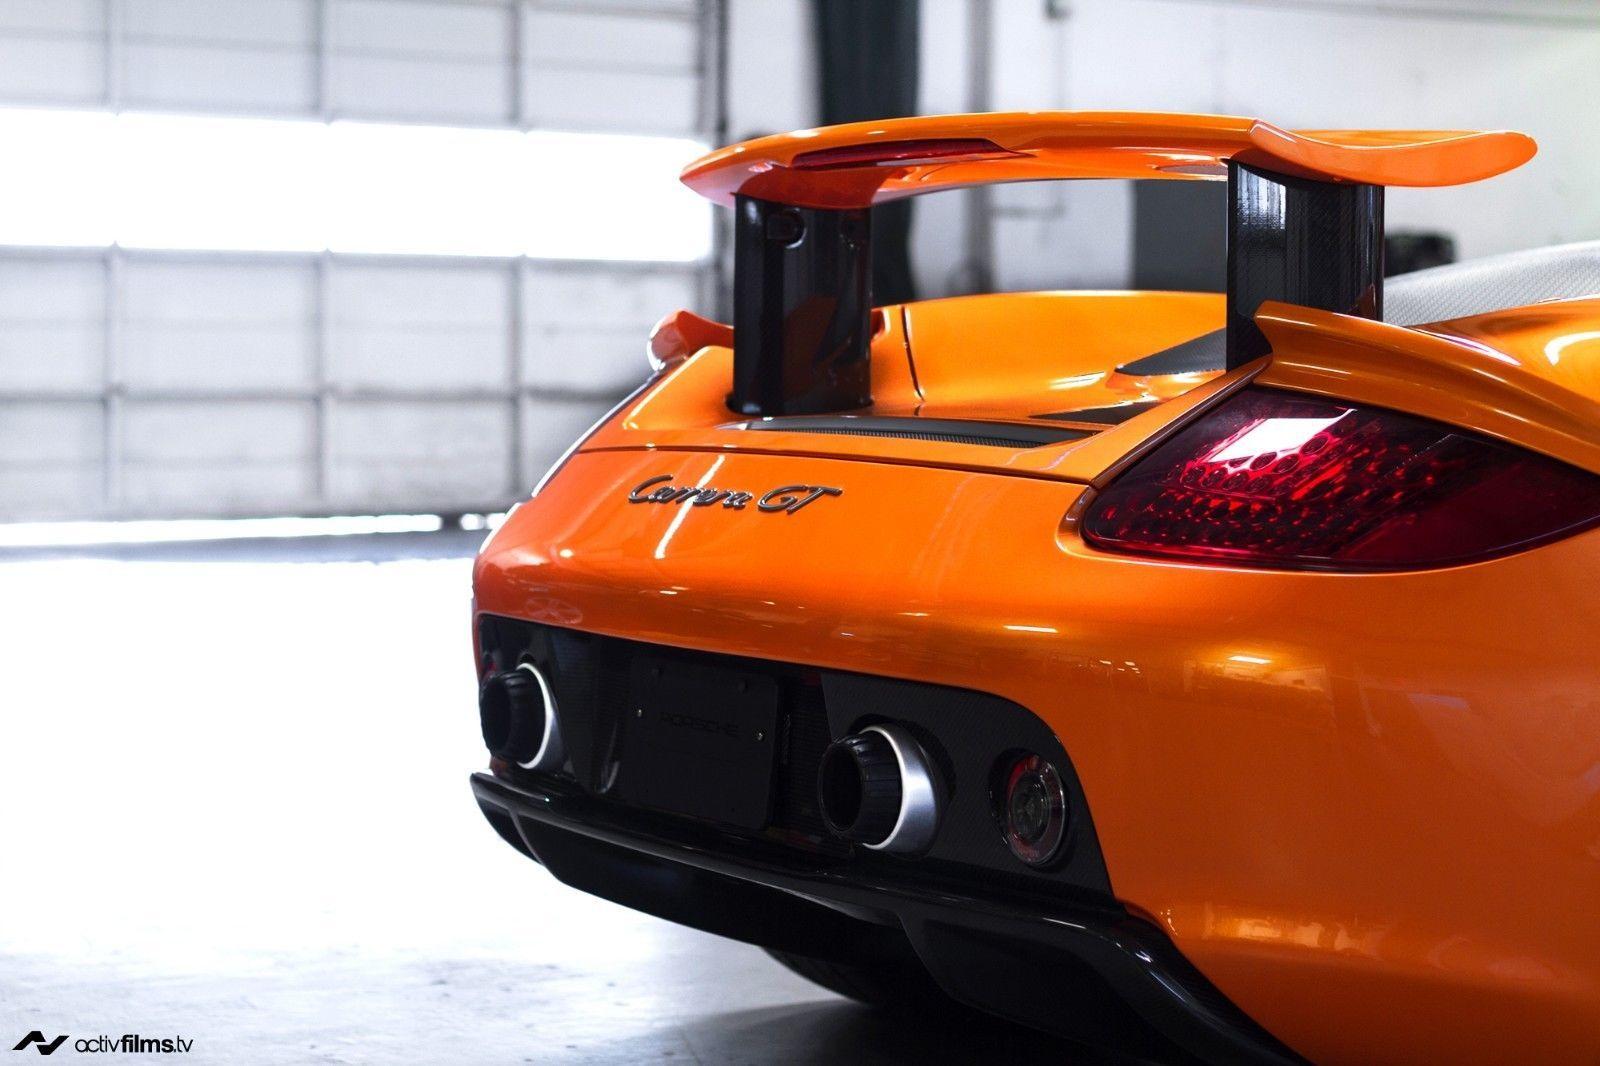 Porsche_Carrera_GT_Αrancio_Βorealis_0003